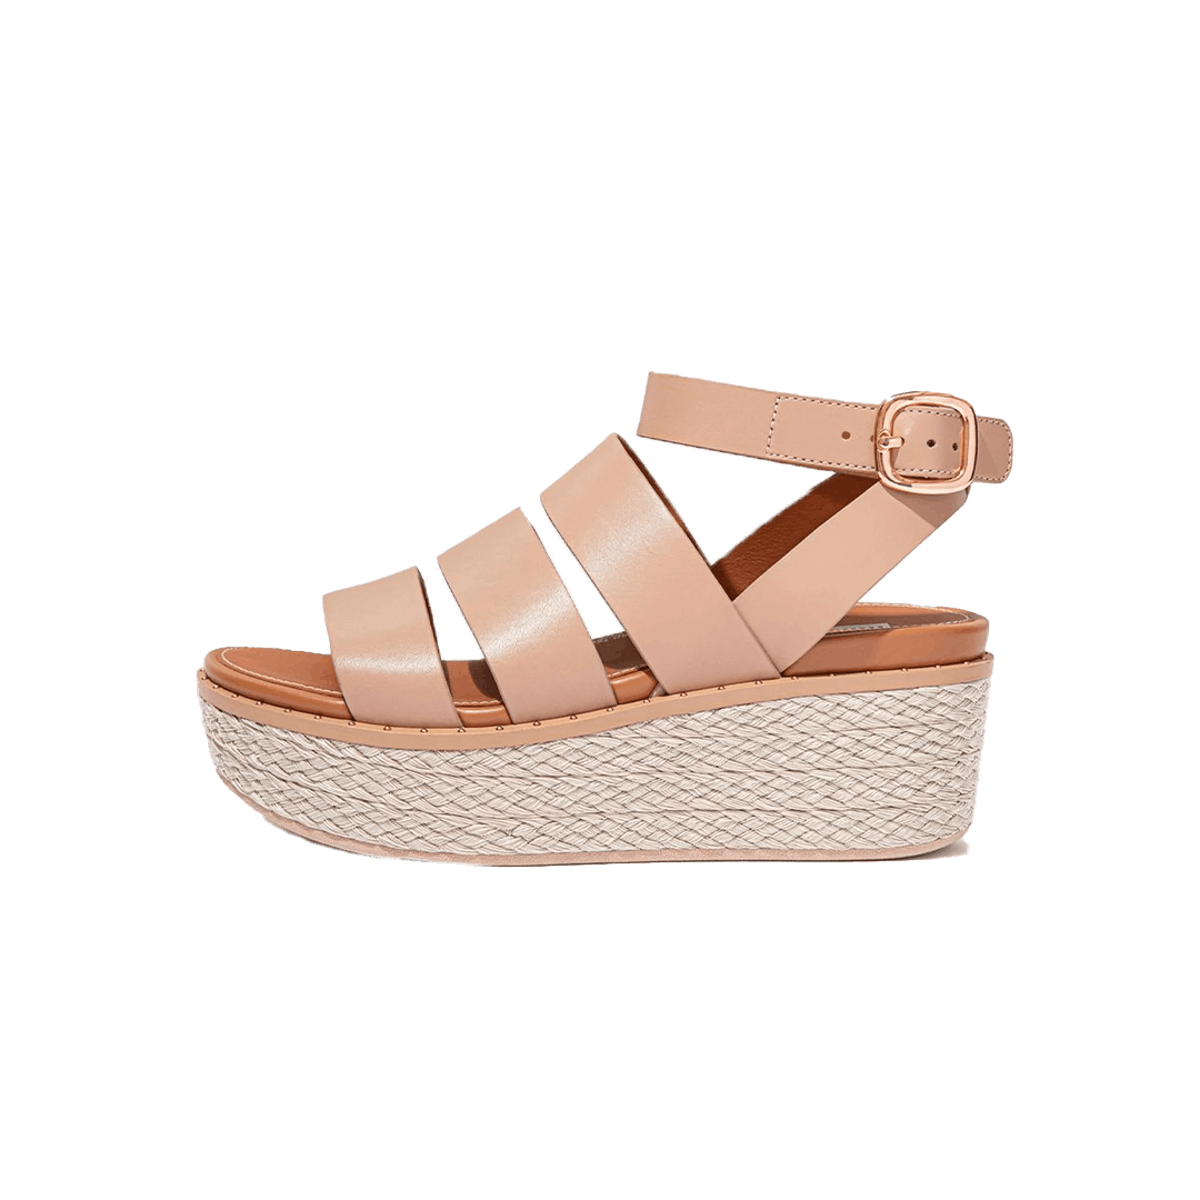 ELOISE - Espadrille Leather Wedge Sandals